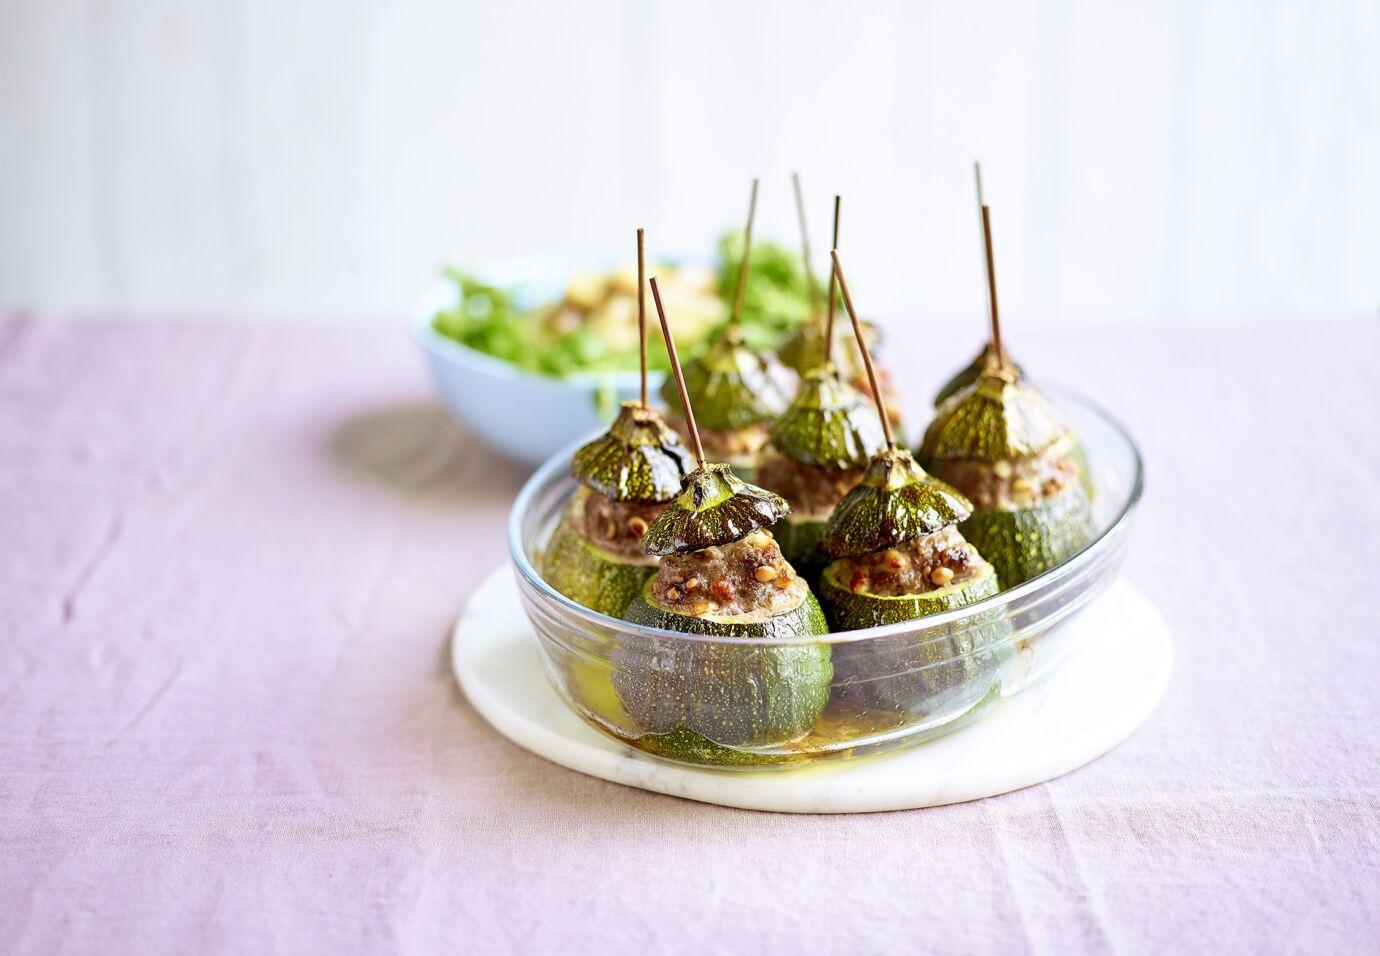 Sofie Dumont courgettes gevuld met lamsvlees, aardappelsla met waterkers